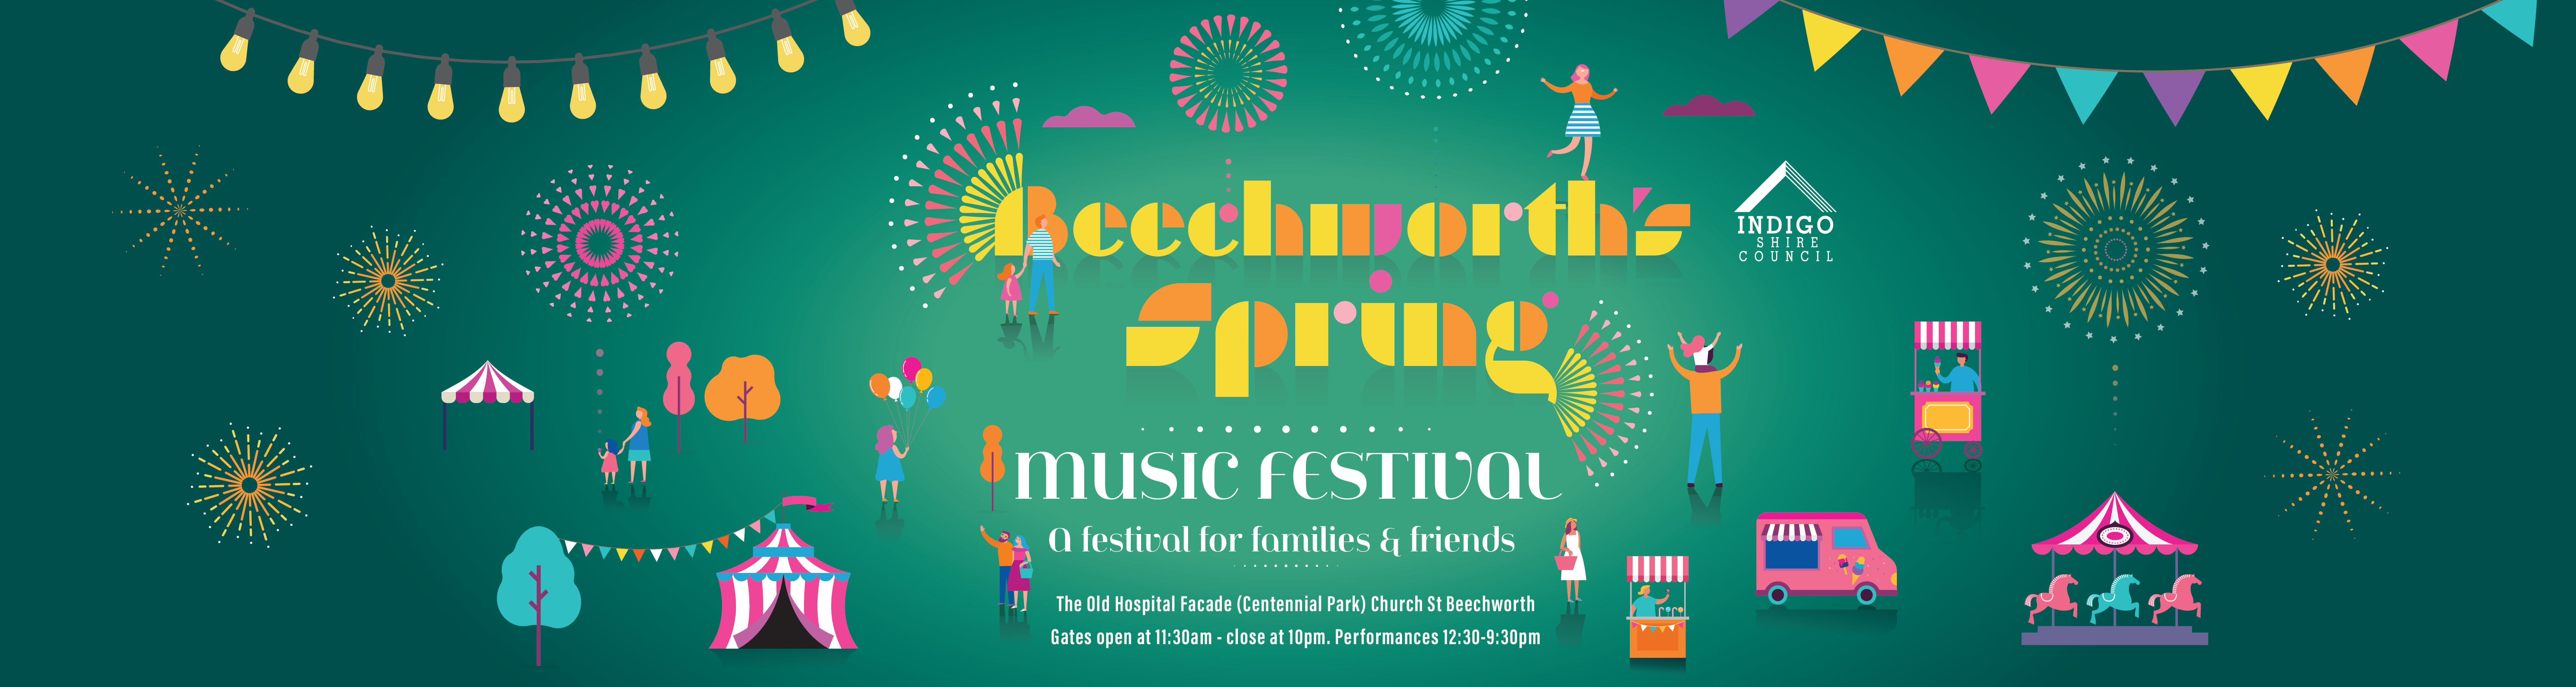 Beechworth Spring Music Festival Baner